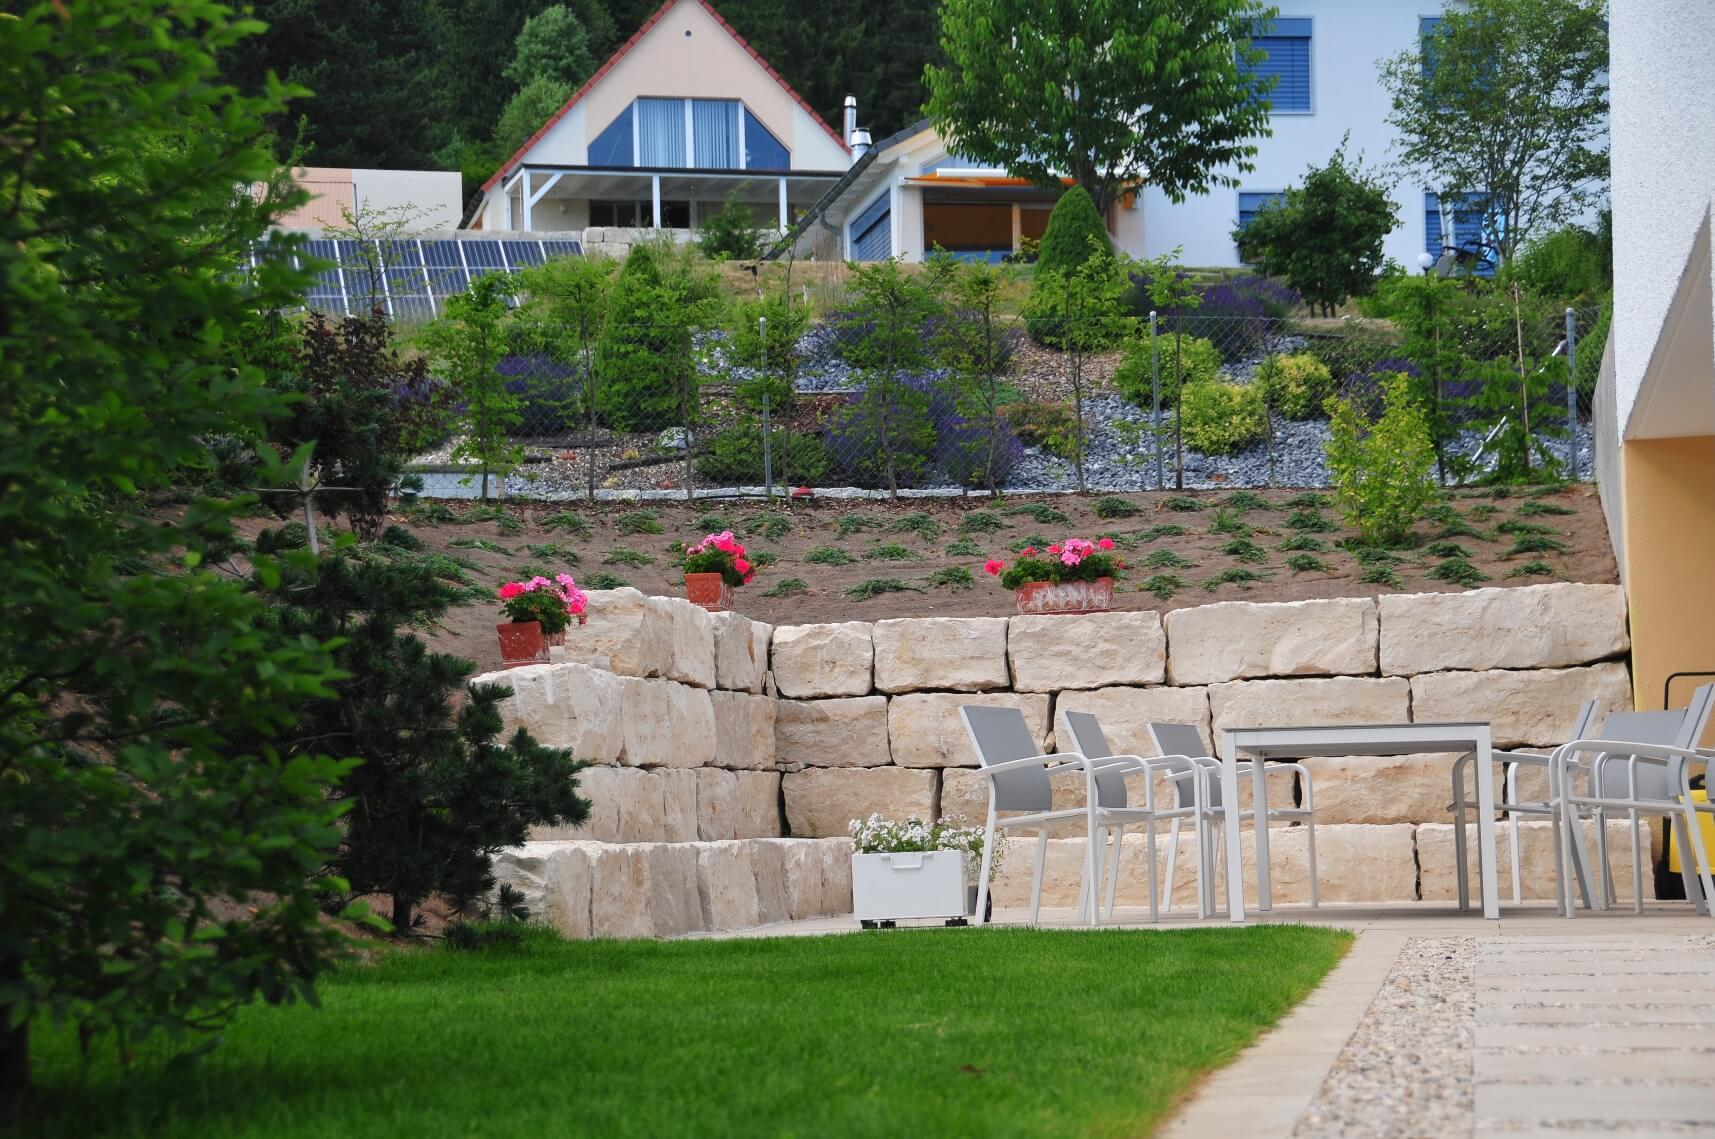 paysagiste tramelan villa terrasse jardin mur en pierres calcaires aellig paysages (6)